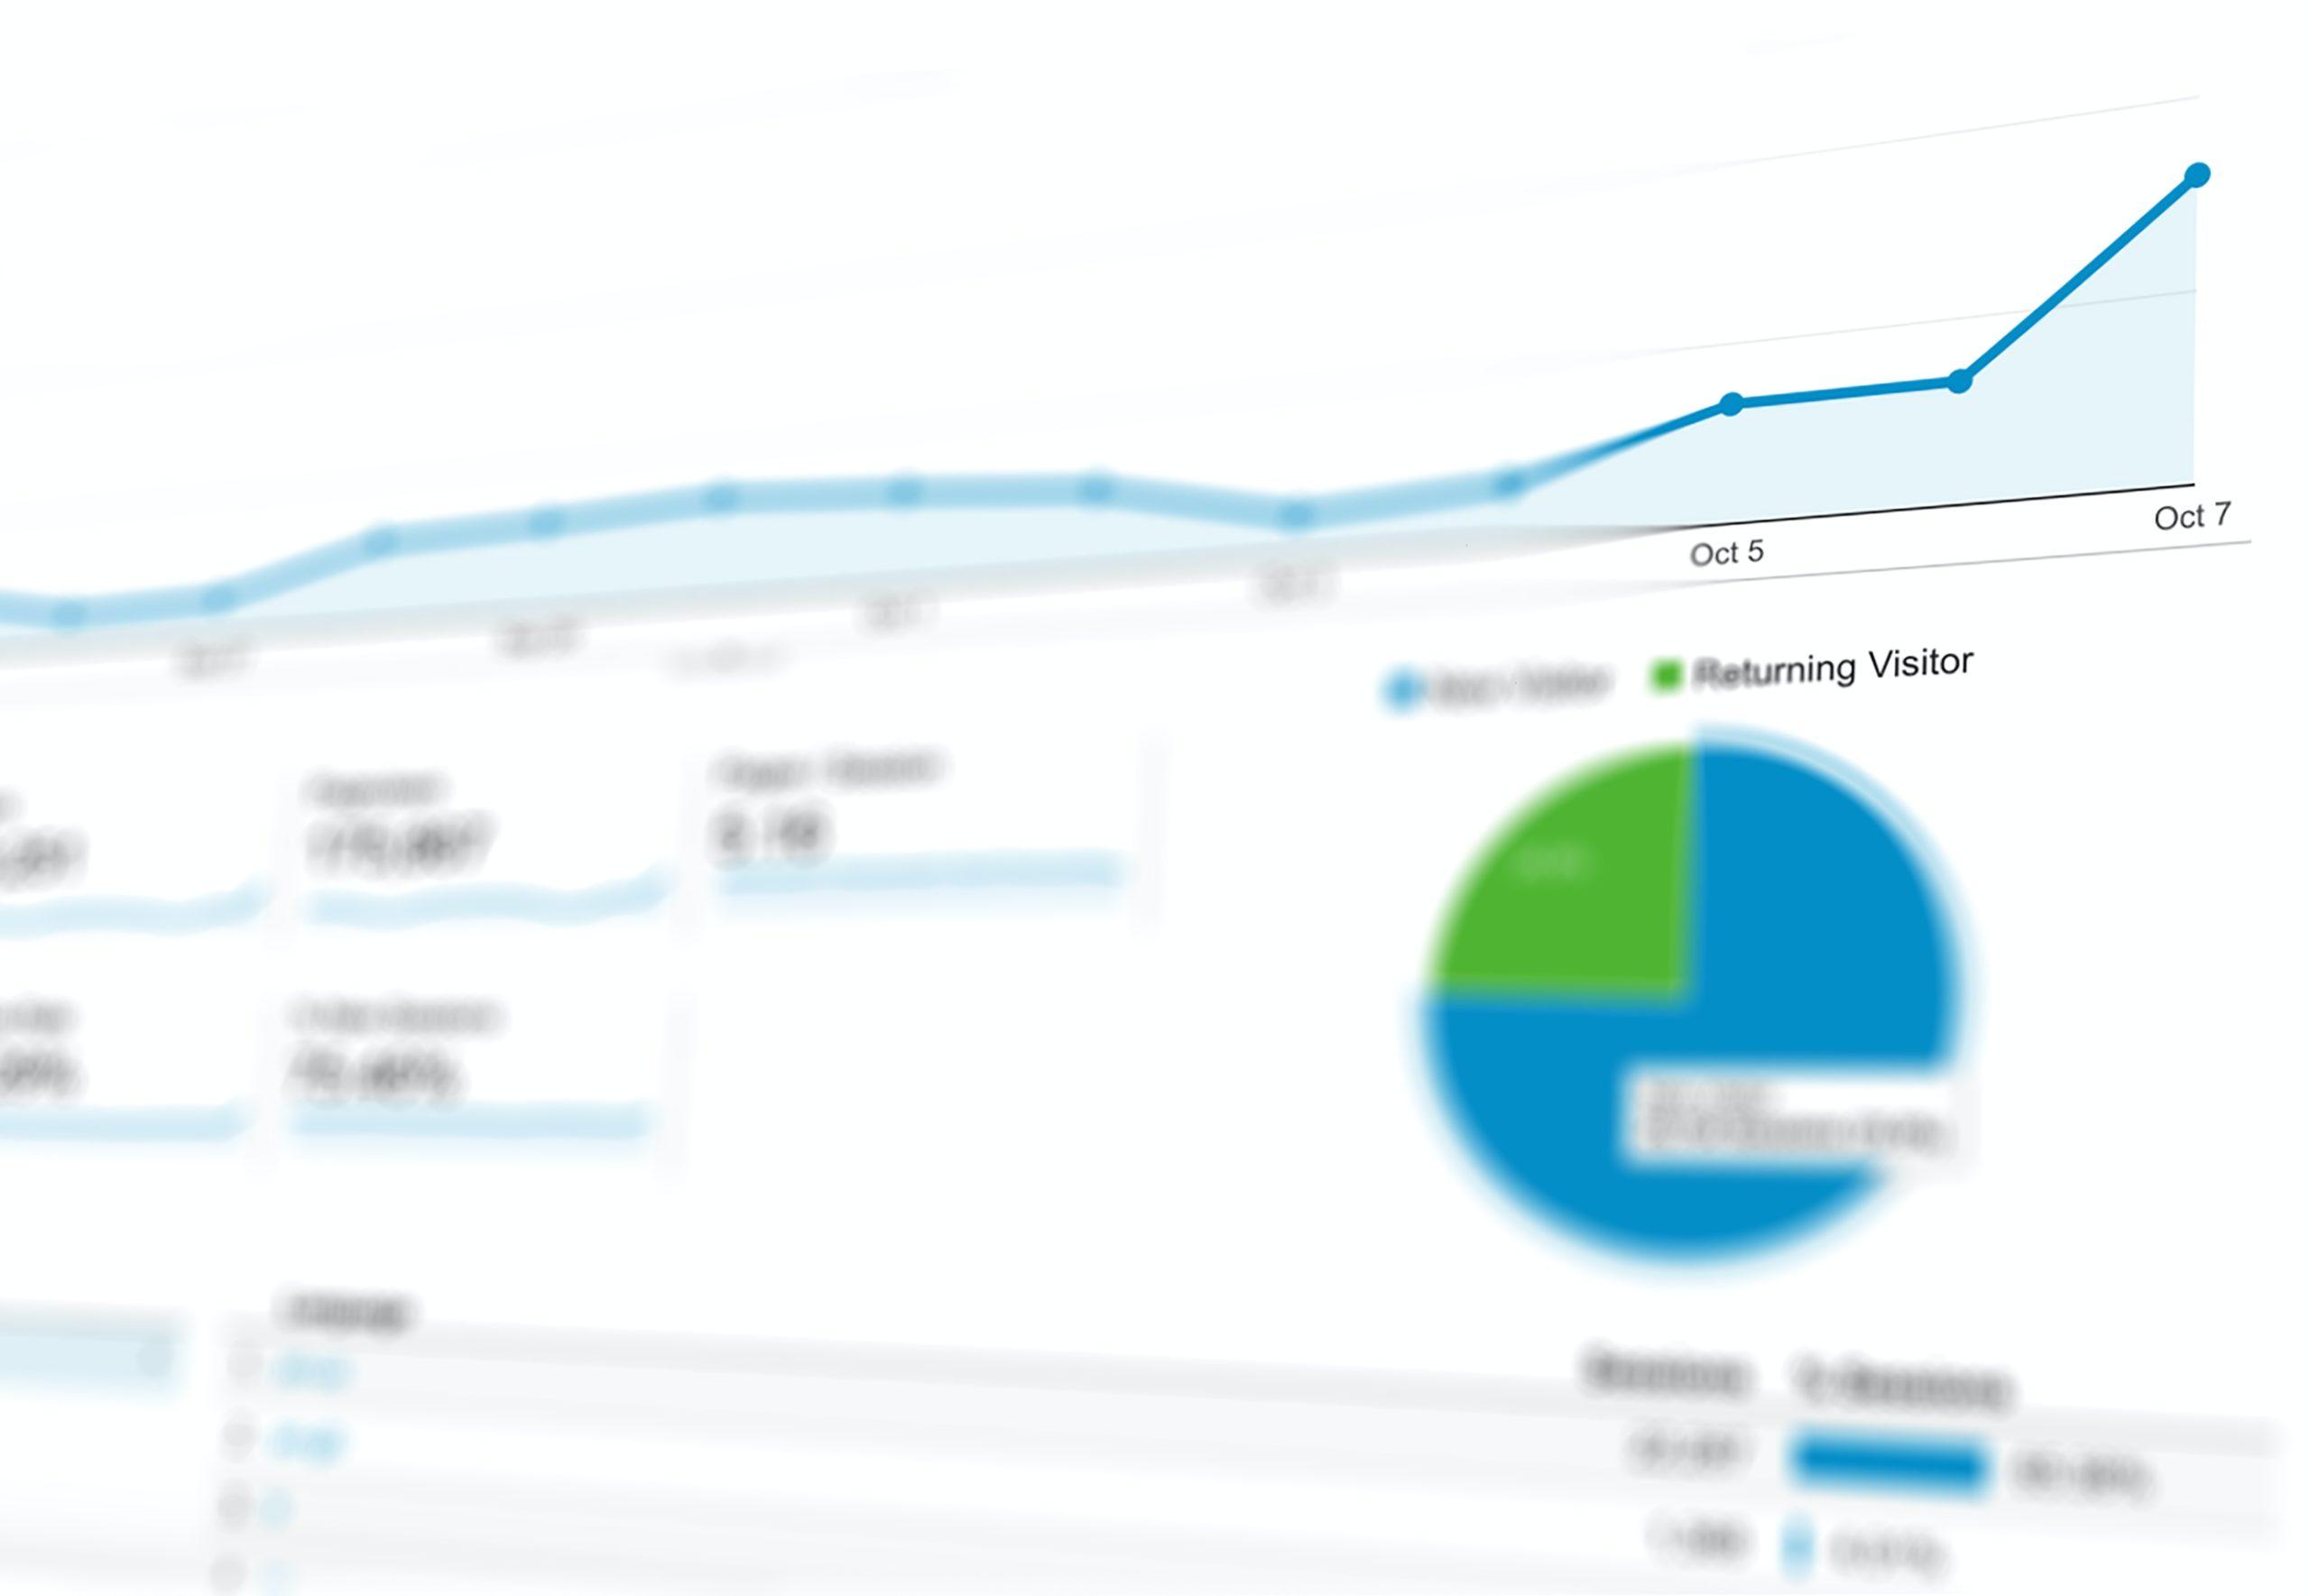 BI tools analytics